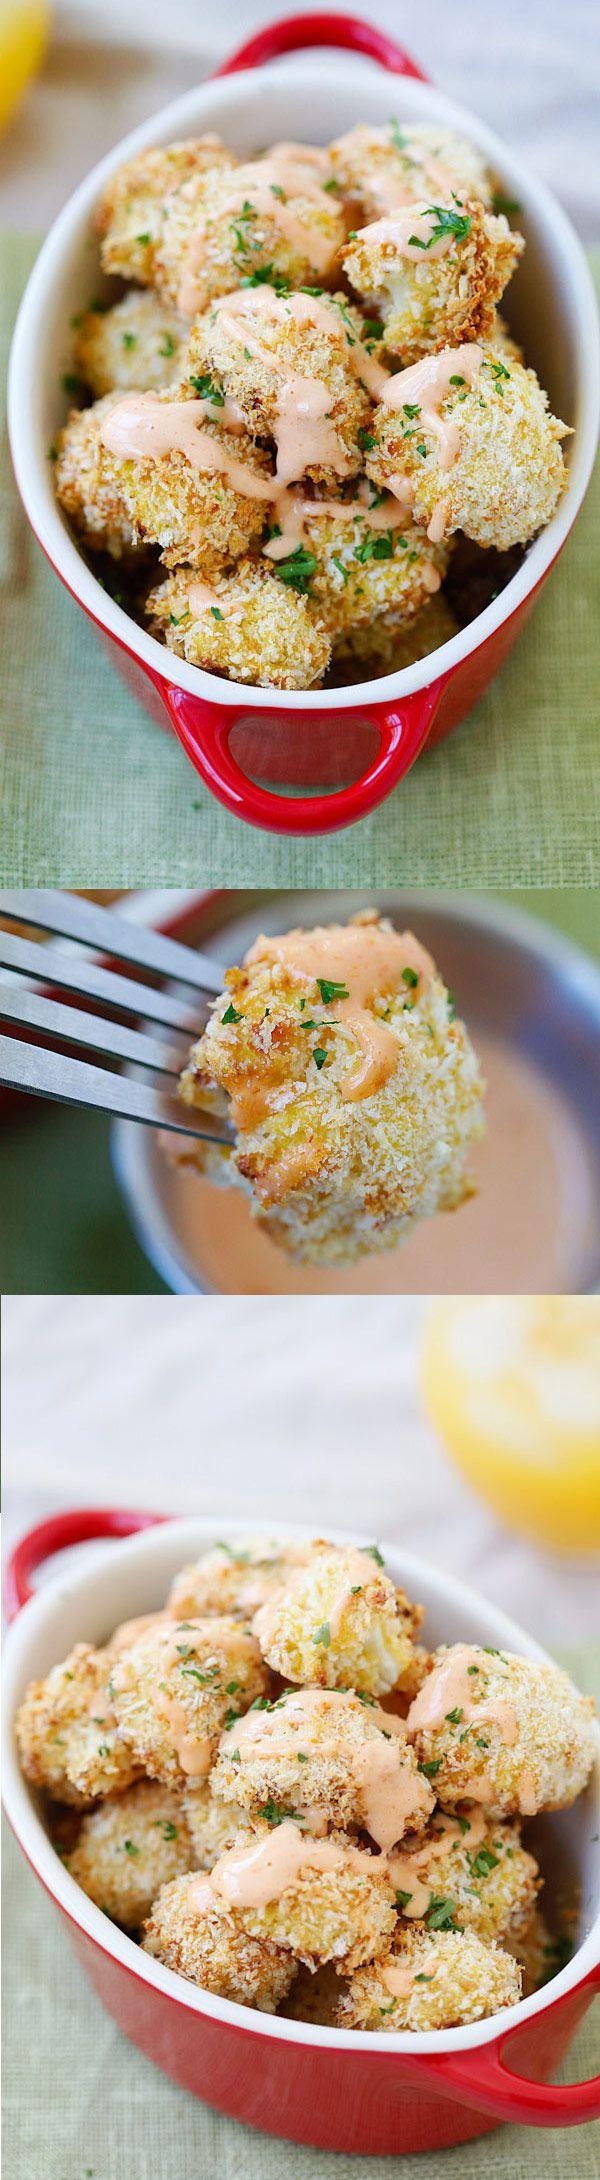 Parmesan Baked Cauliflower – crispy, healthy cauliflower coated with Parmesan cheese and panko bread crumbs. Easy, yummy and so good!   rasamalaysia.com